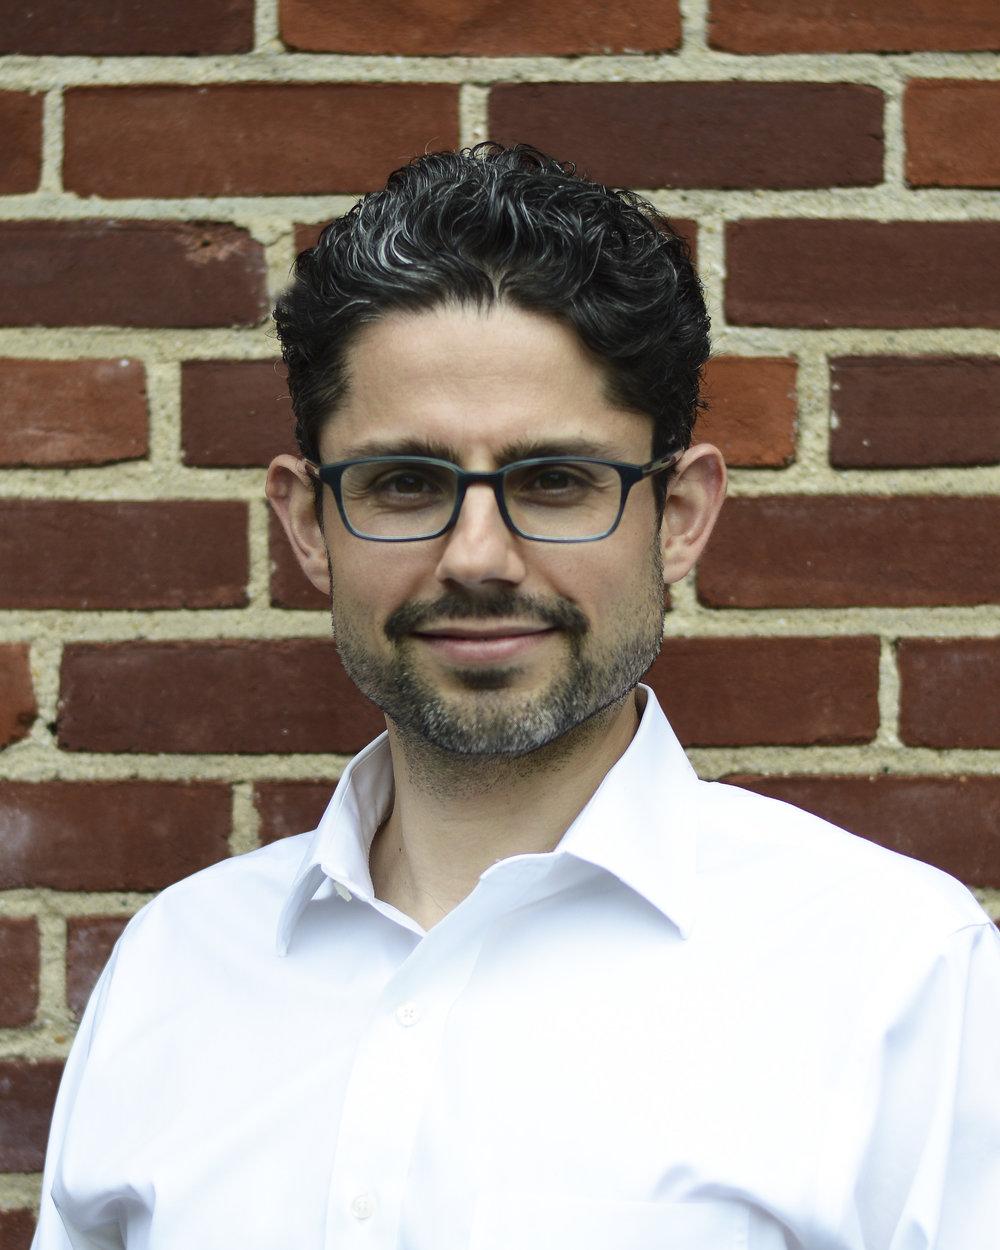 Joshua Horowitz Portfolio Manager